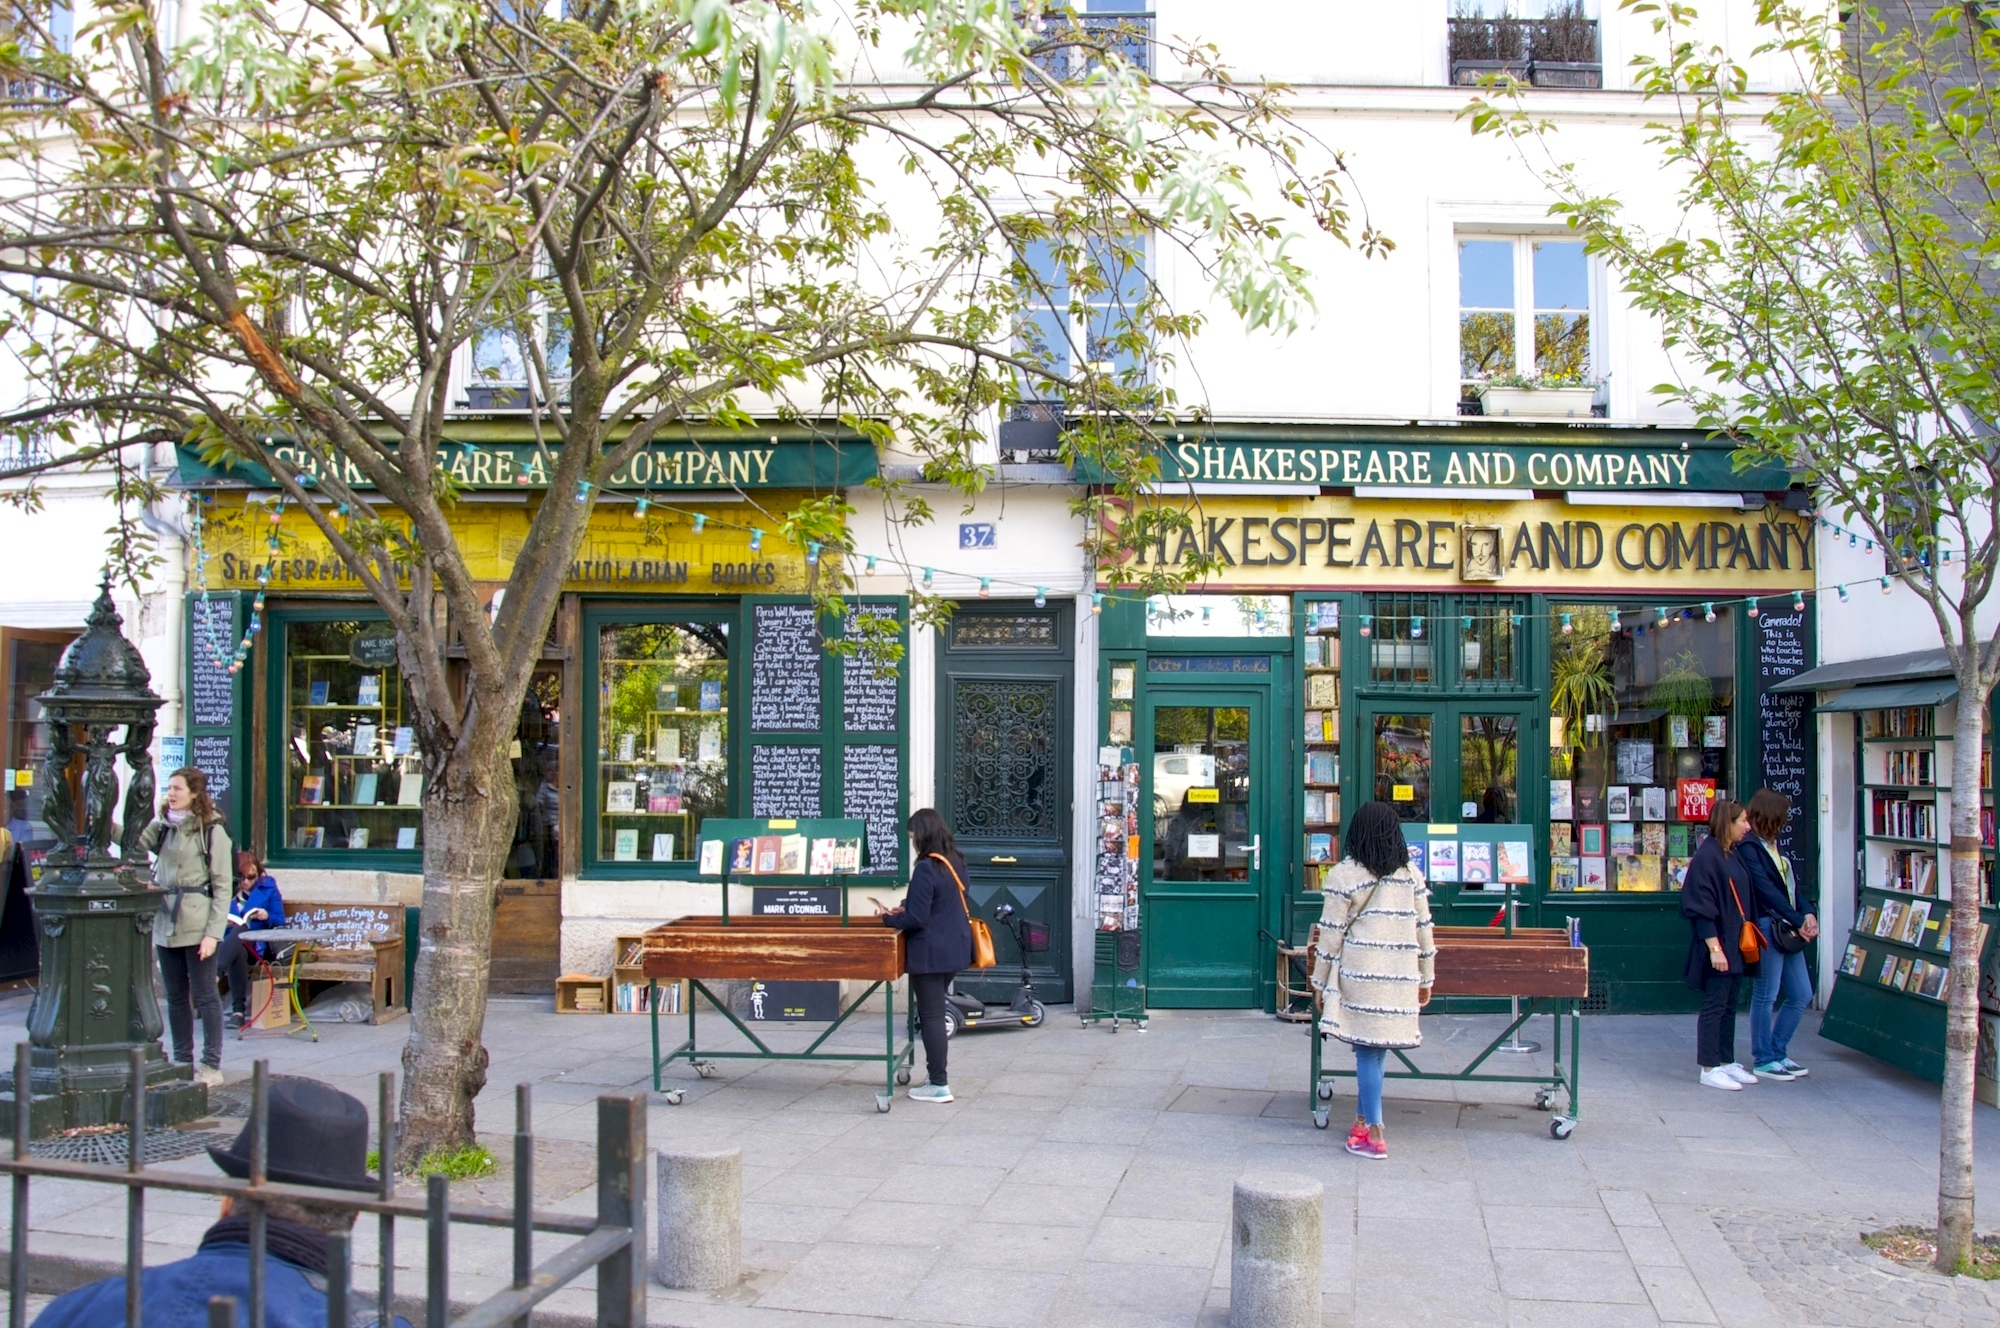 HiP Paris Blog explores moving to Paris alone